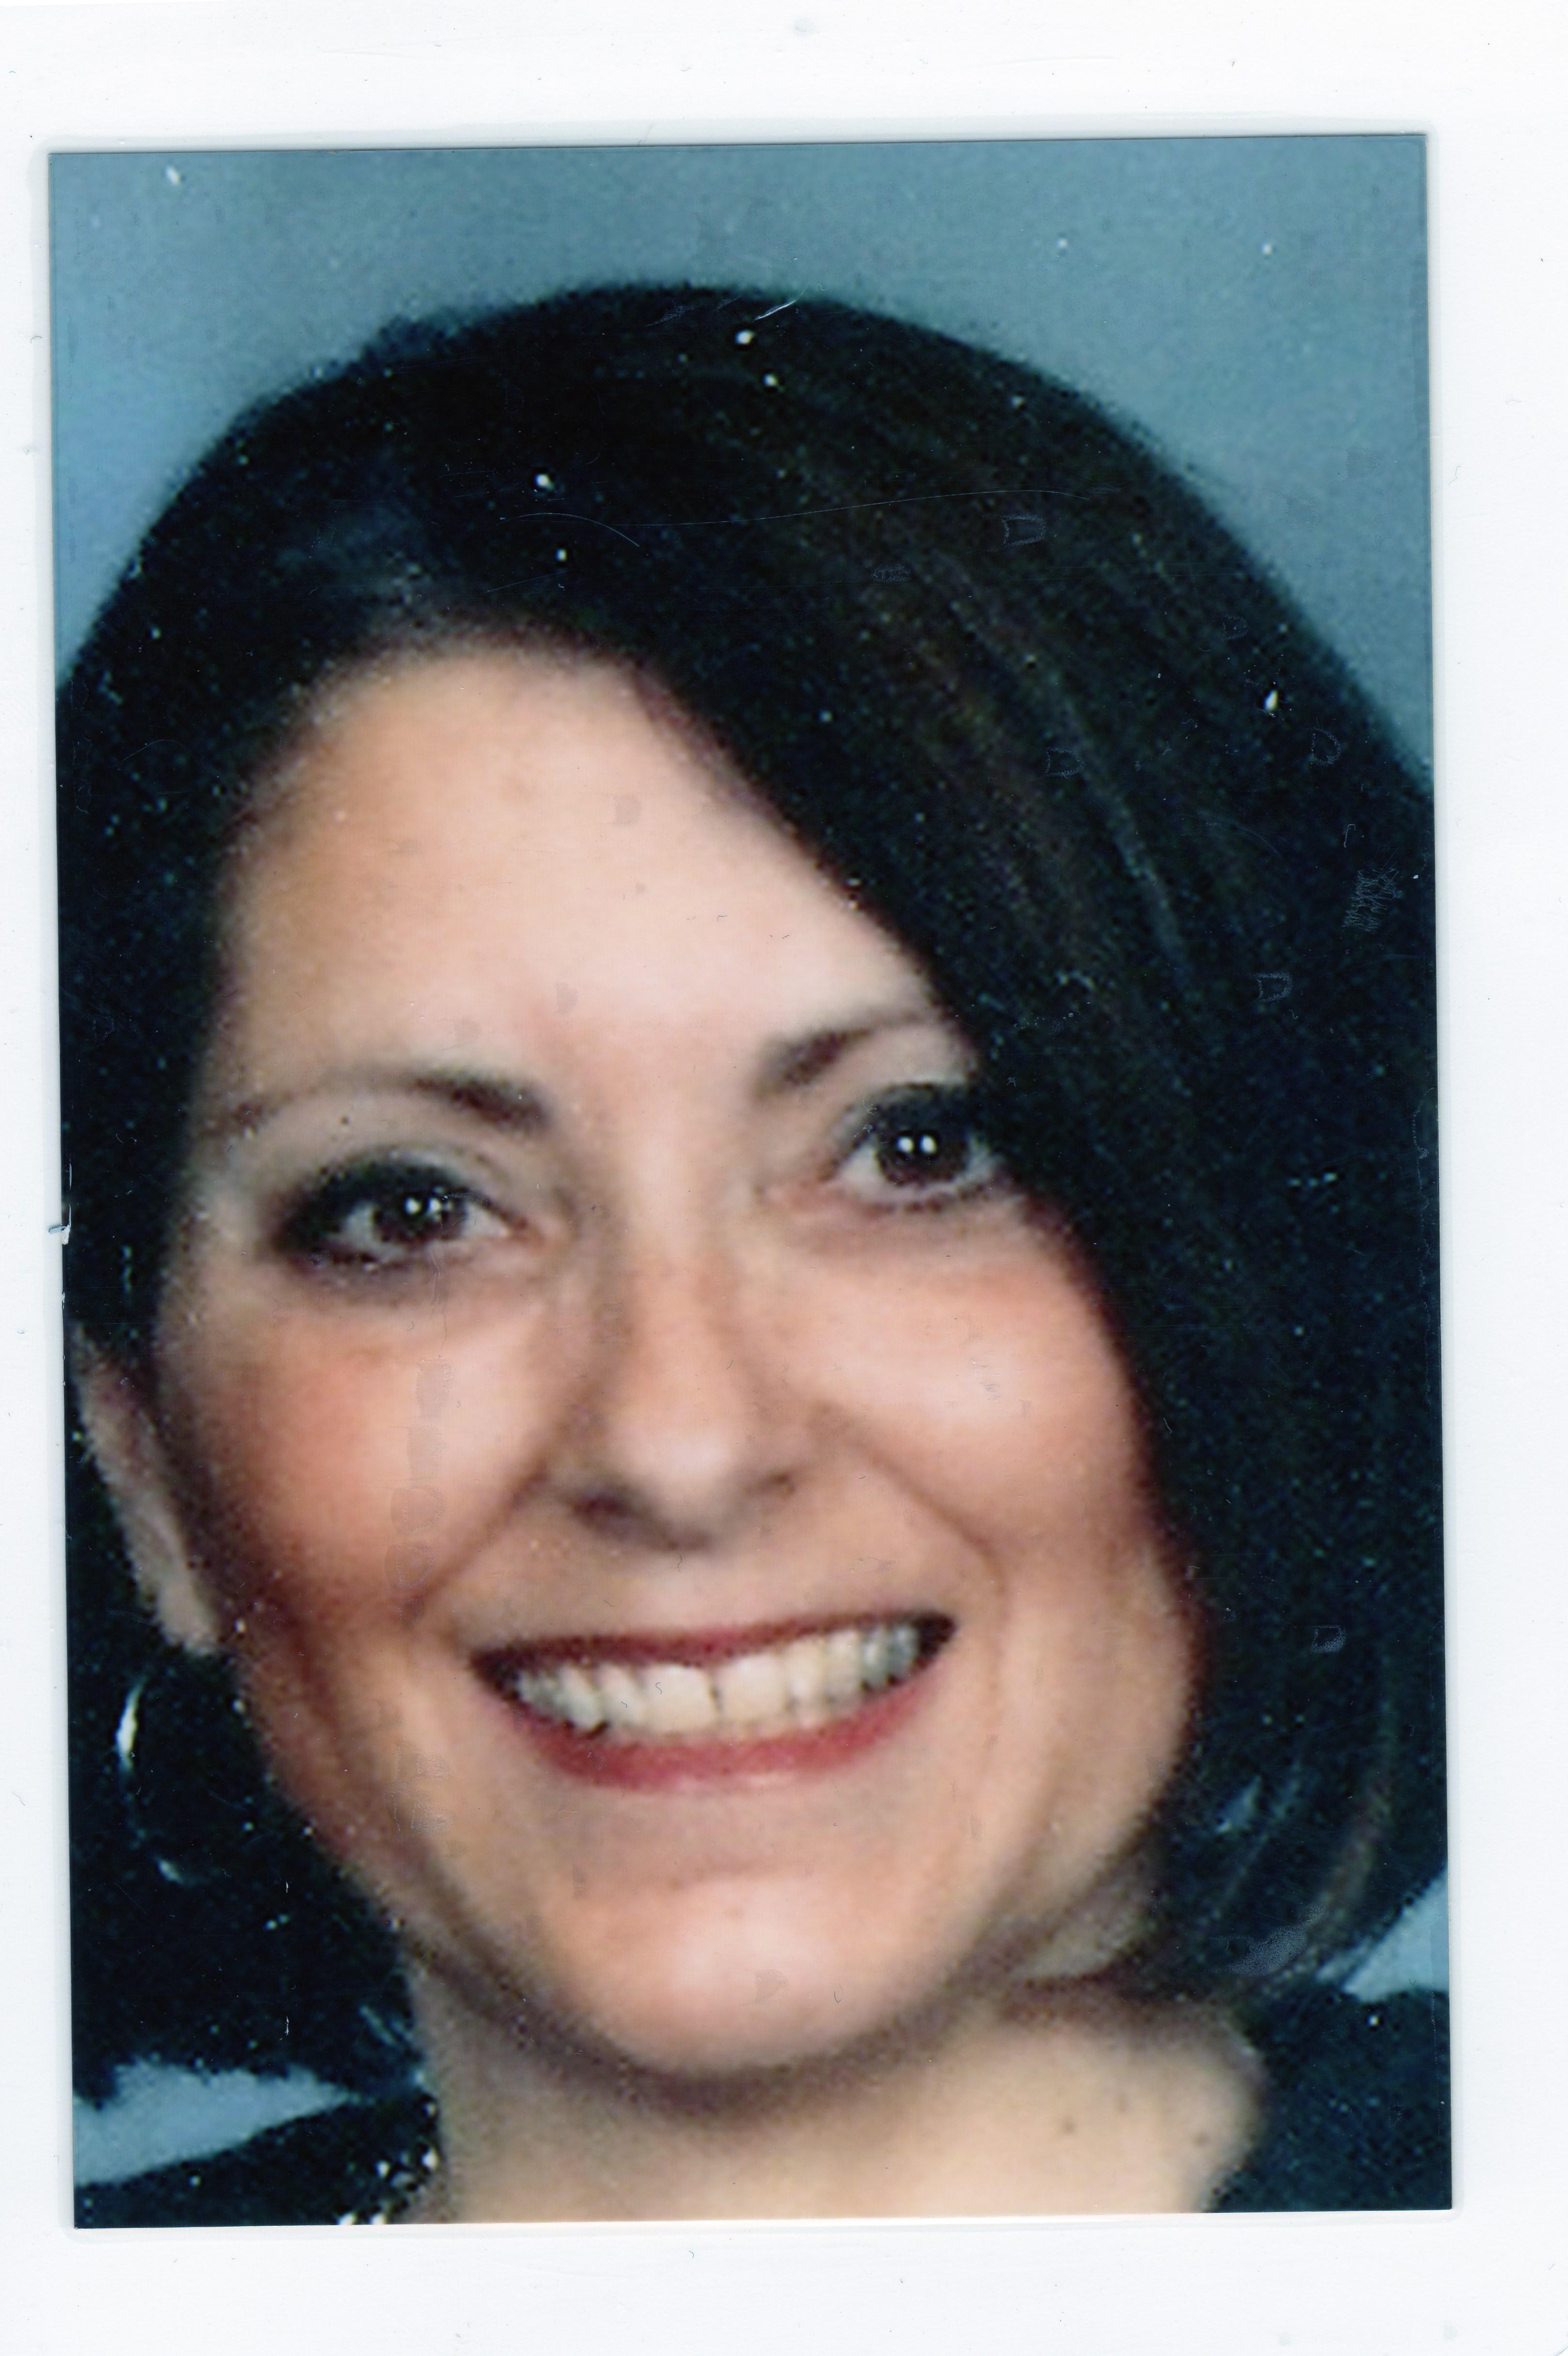 Nancy Sharky